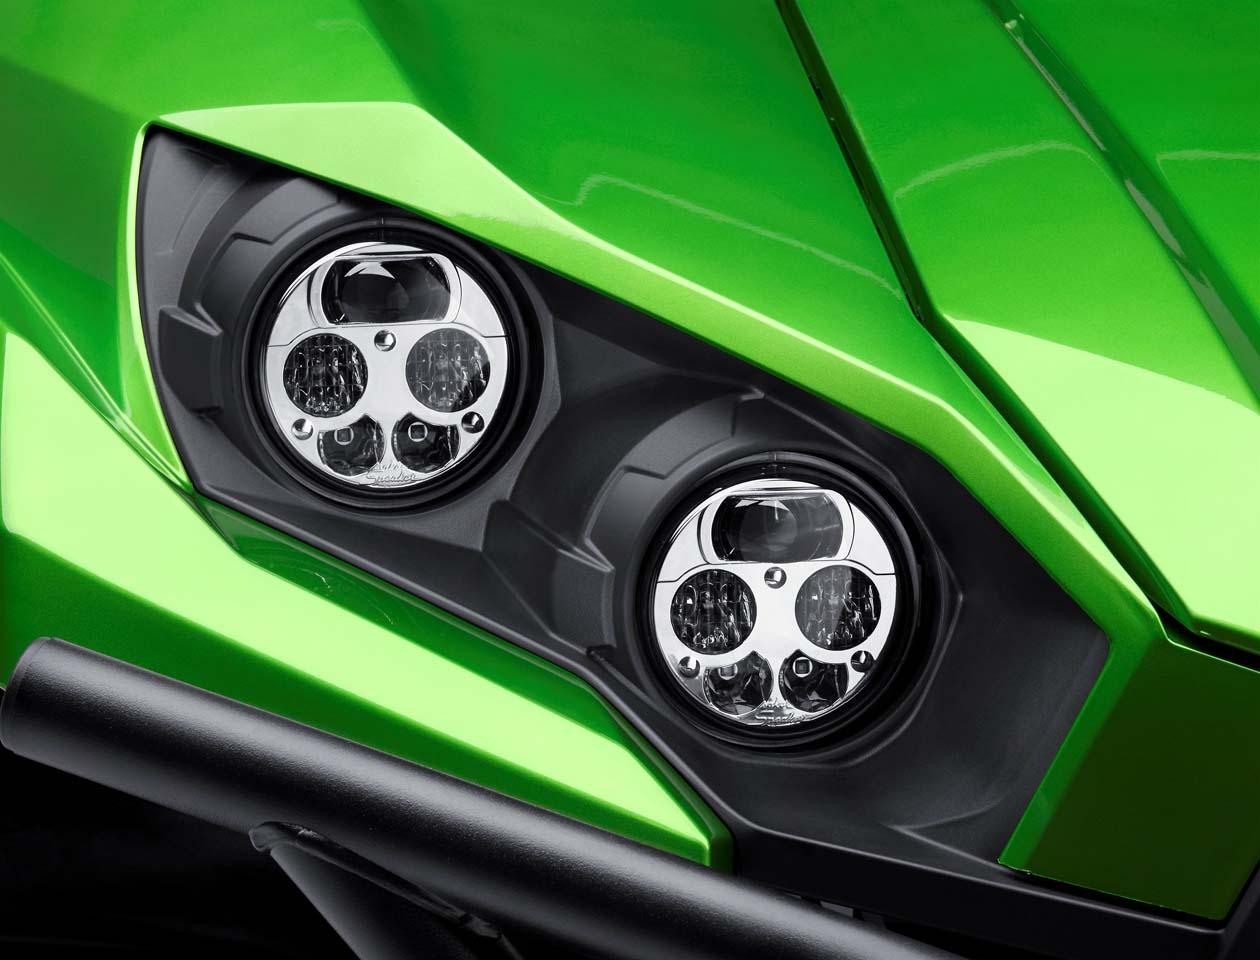 Kawasaki Brute Force Led Headlights